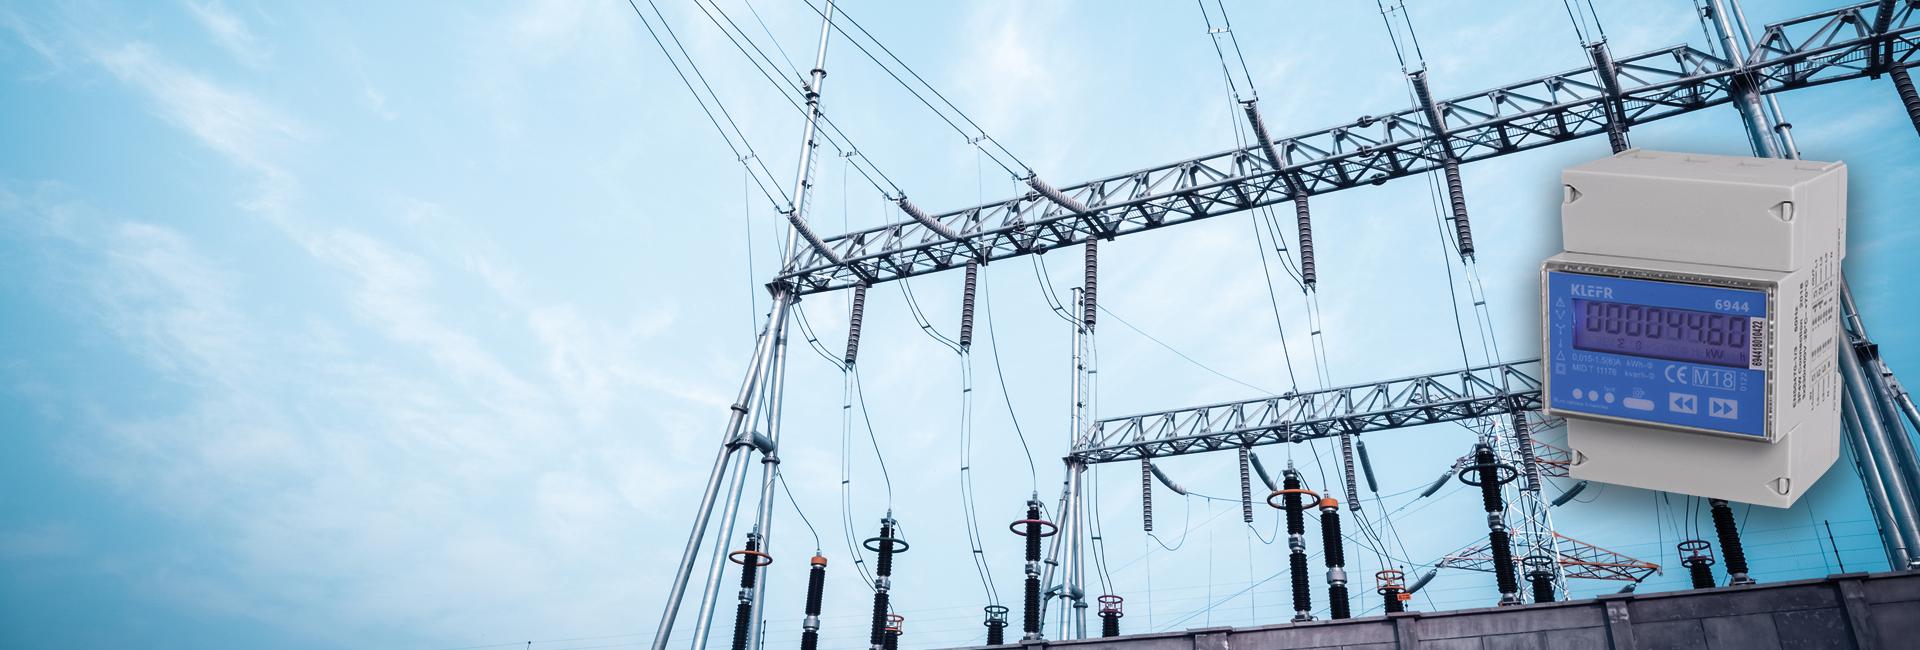 KLEFR three phase energy meter